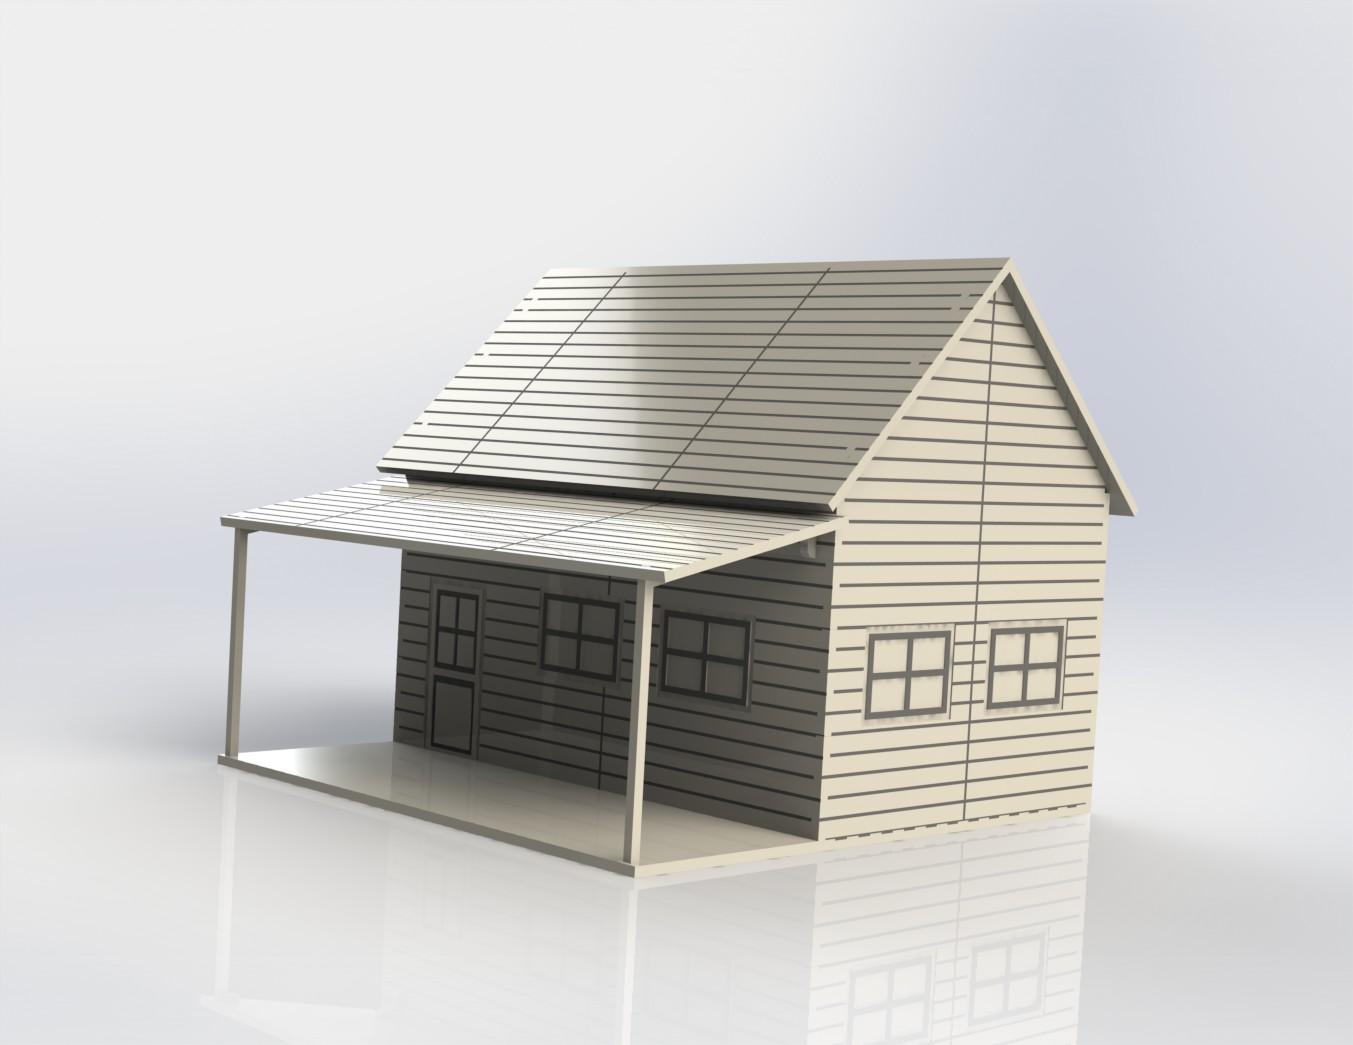 Little Western House In Wood dxf File